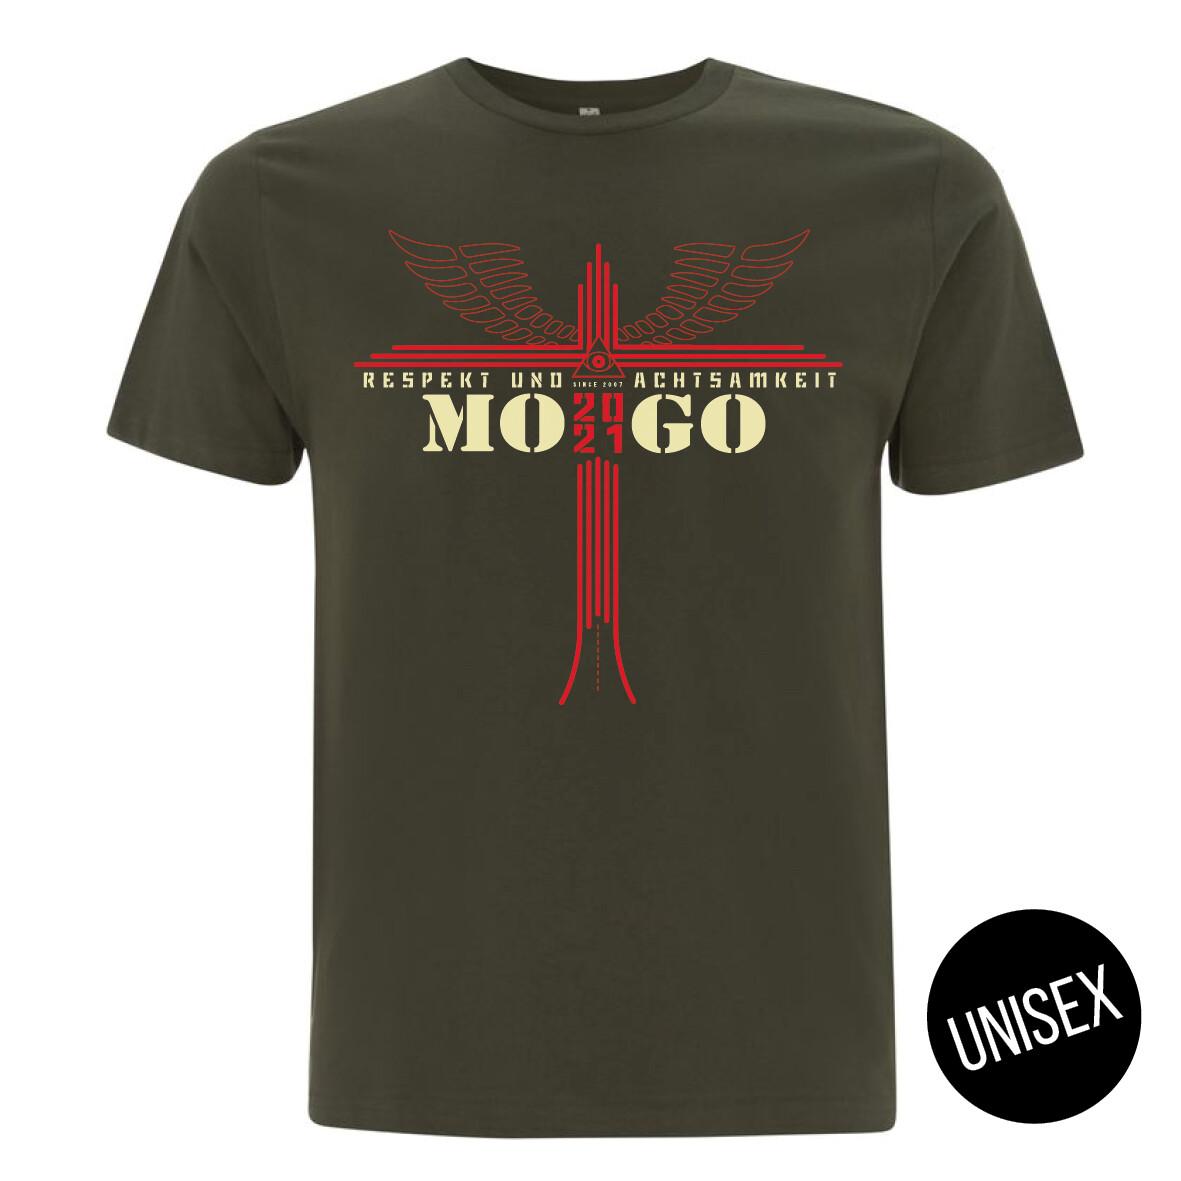 MOGO-Shirt Moss Green (unisex)